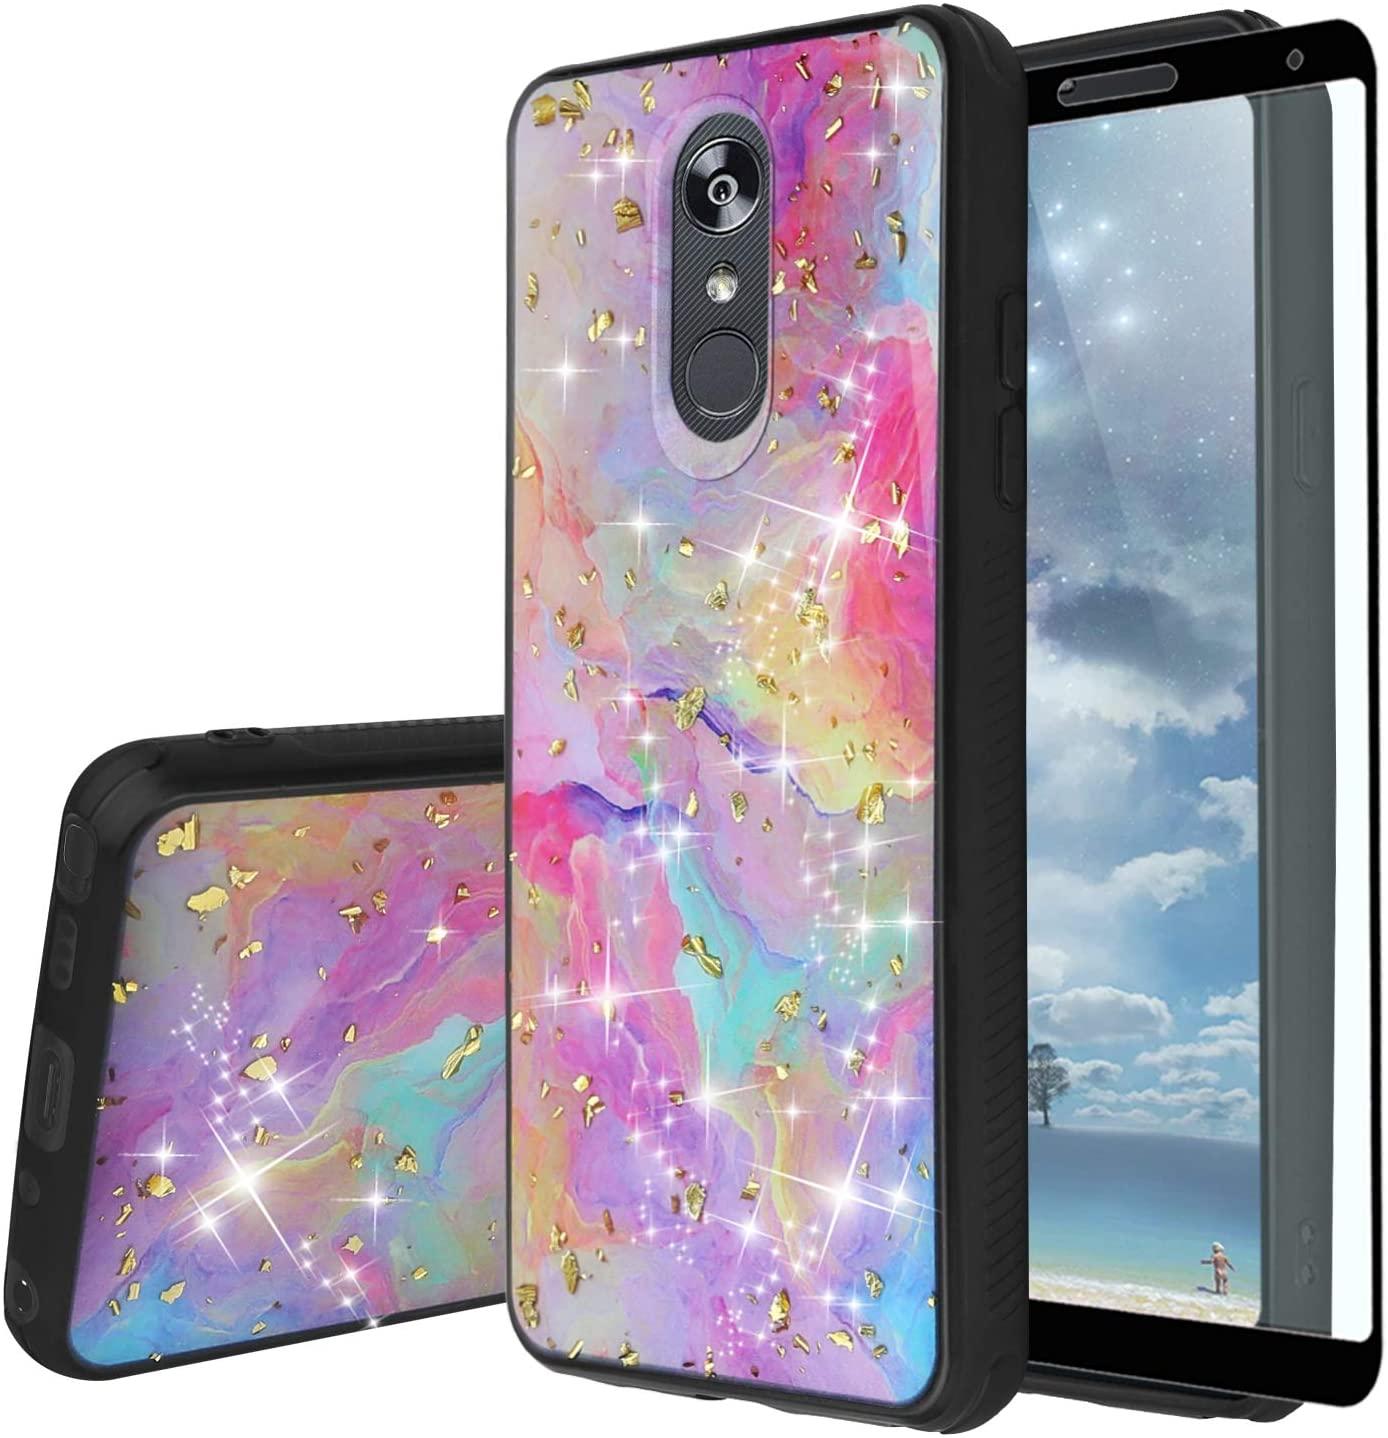 TJS Phone Case Compatible with LG Aristo 4,Aristo 4 Plus +,Escape Plus,K30 2019,Arena 2,Tribute Royal,Journey LTE [Full Coverage Tempered Glass Screen Protector] Chrome Flake Glitter Skin (Rainbow)